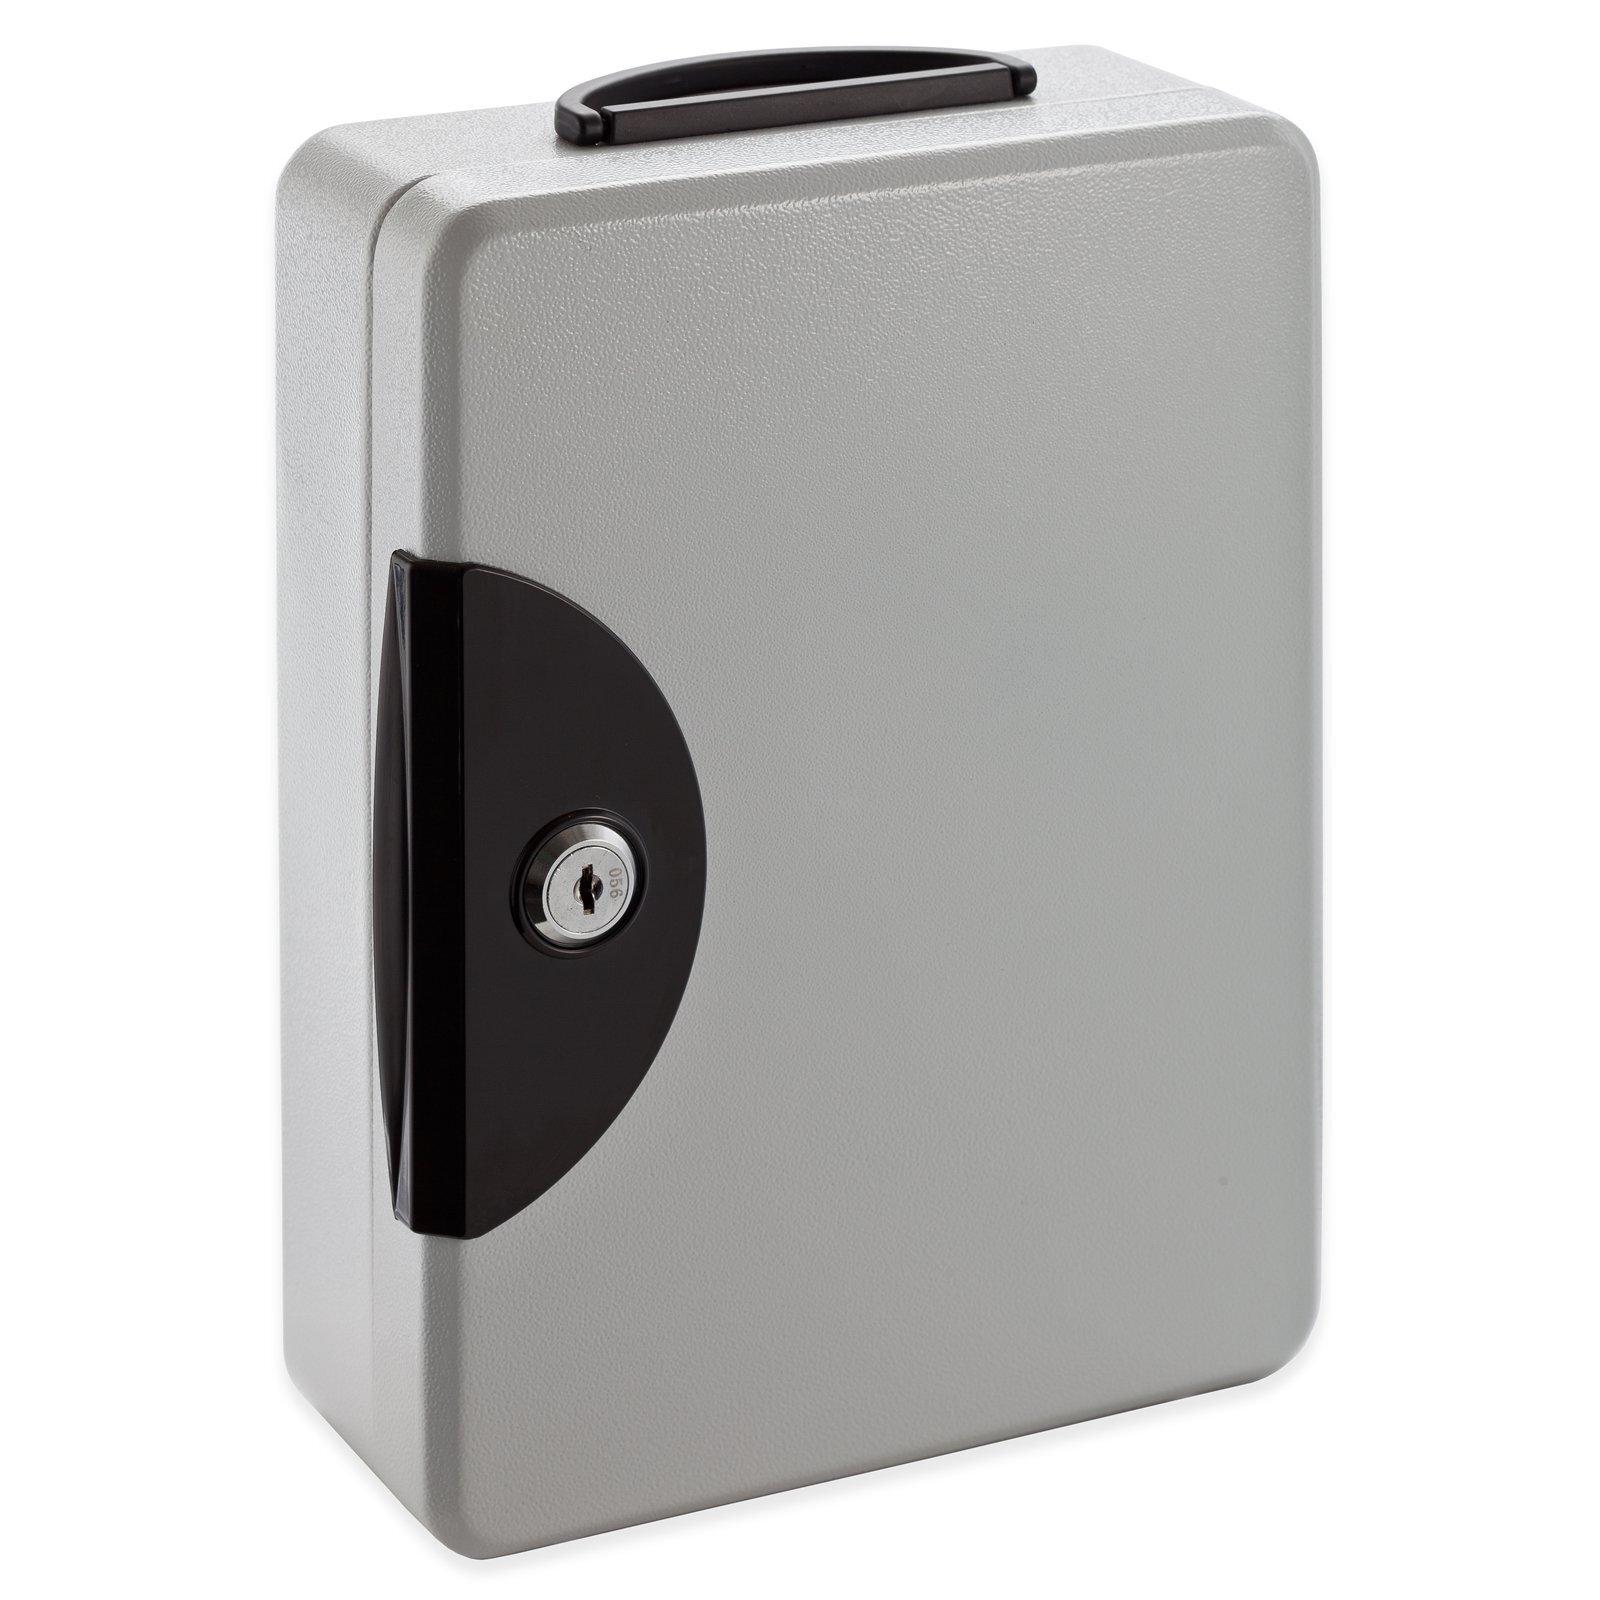 Sandleford 190 x 255 x 75mm 48 Key Cabinet